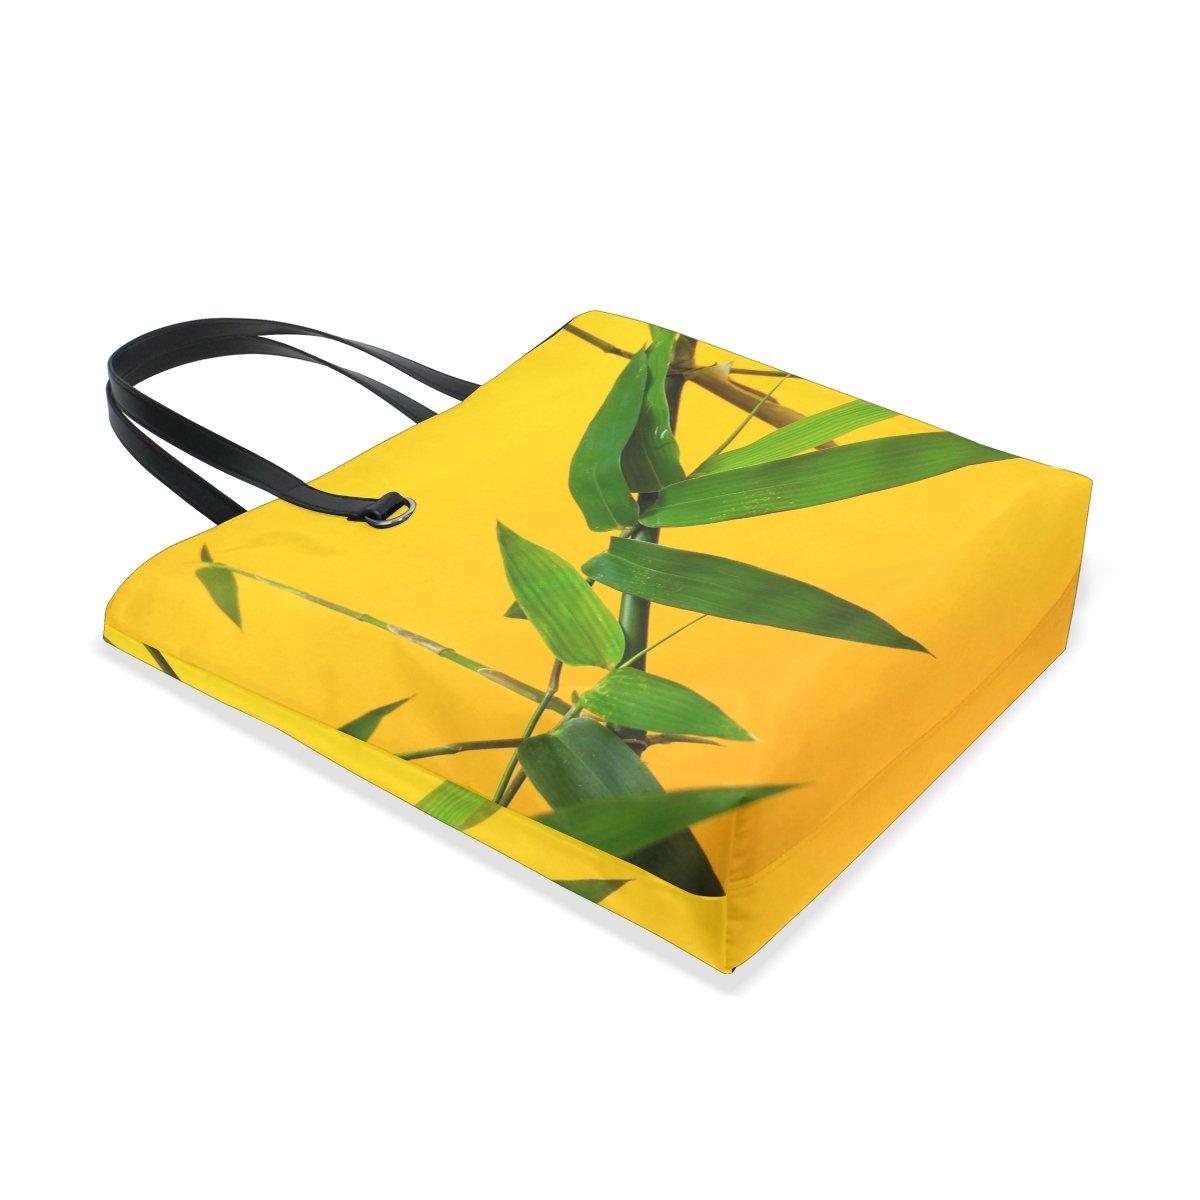 AHOMY Bamboo Leaf Lady Personalized casual Shoulder Bag Satchel Handbag Tote Bag Handbag for Women Girls